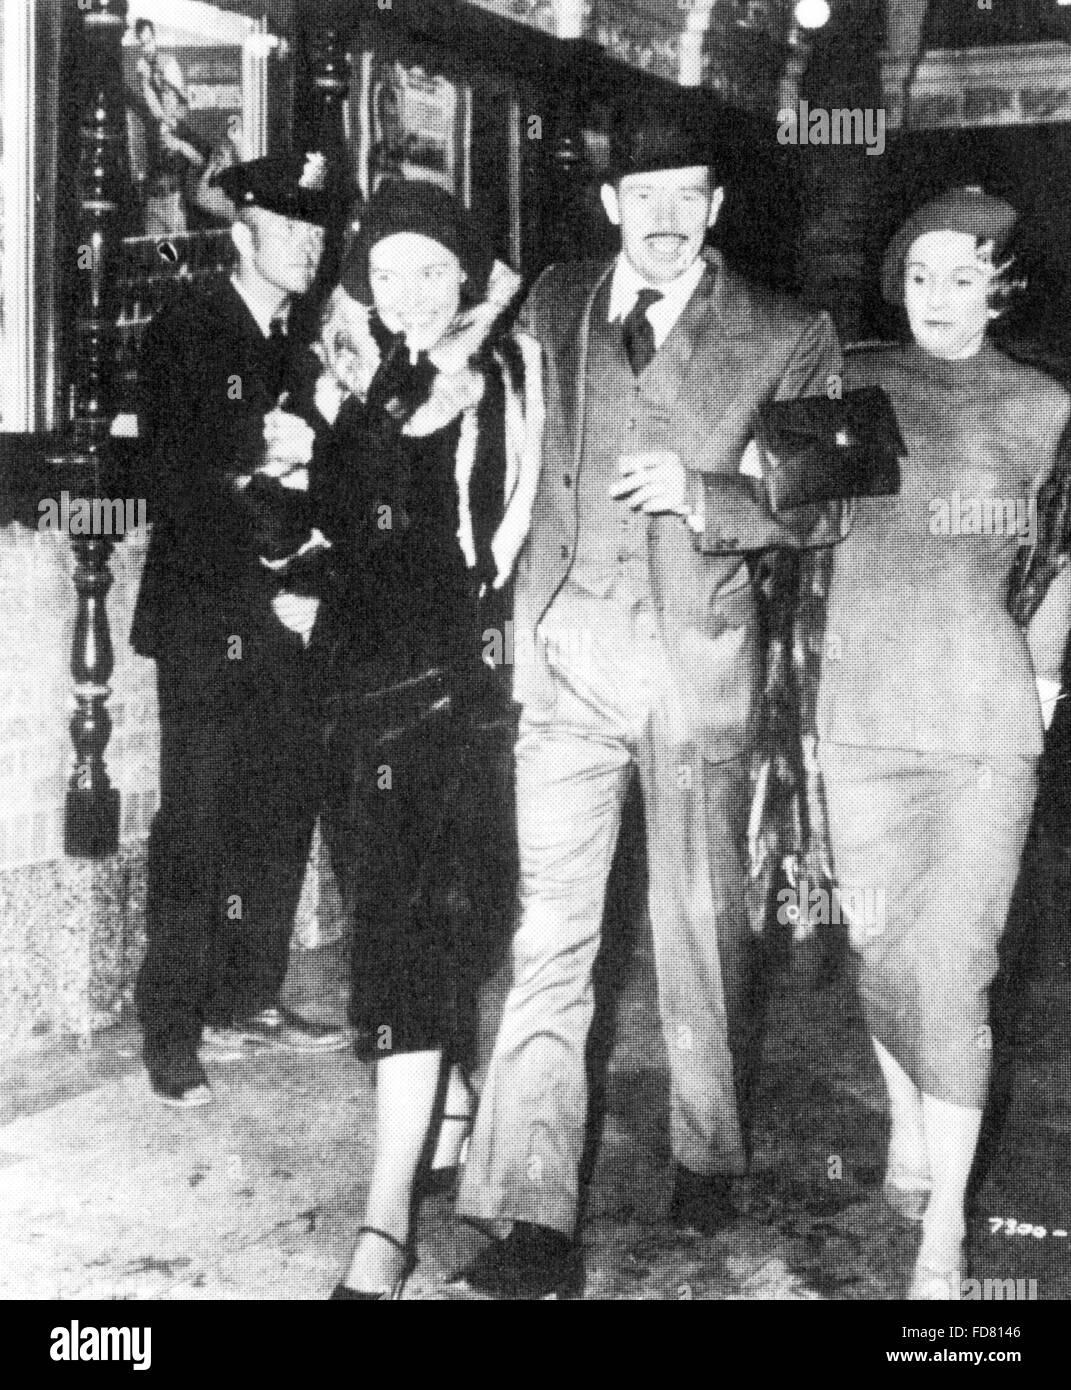 Movie still: the death of John Dillinger, 1934 - Stock Image